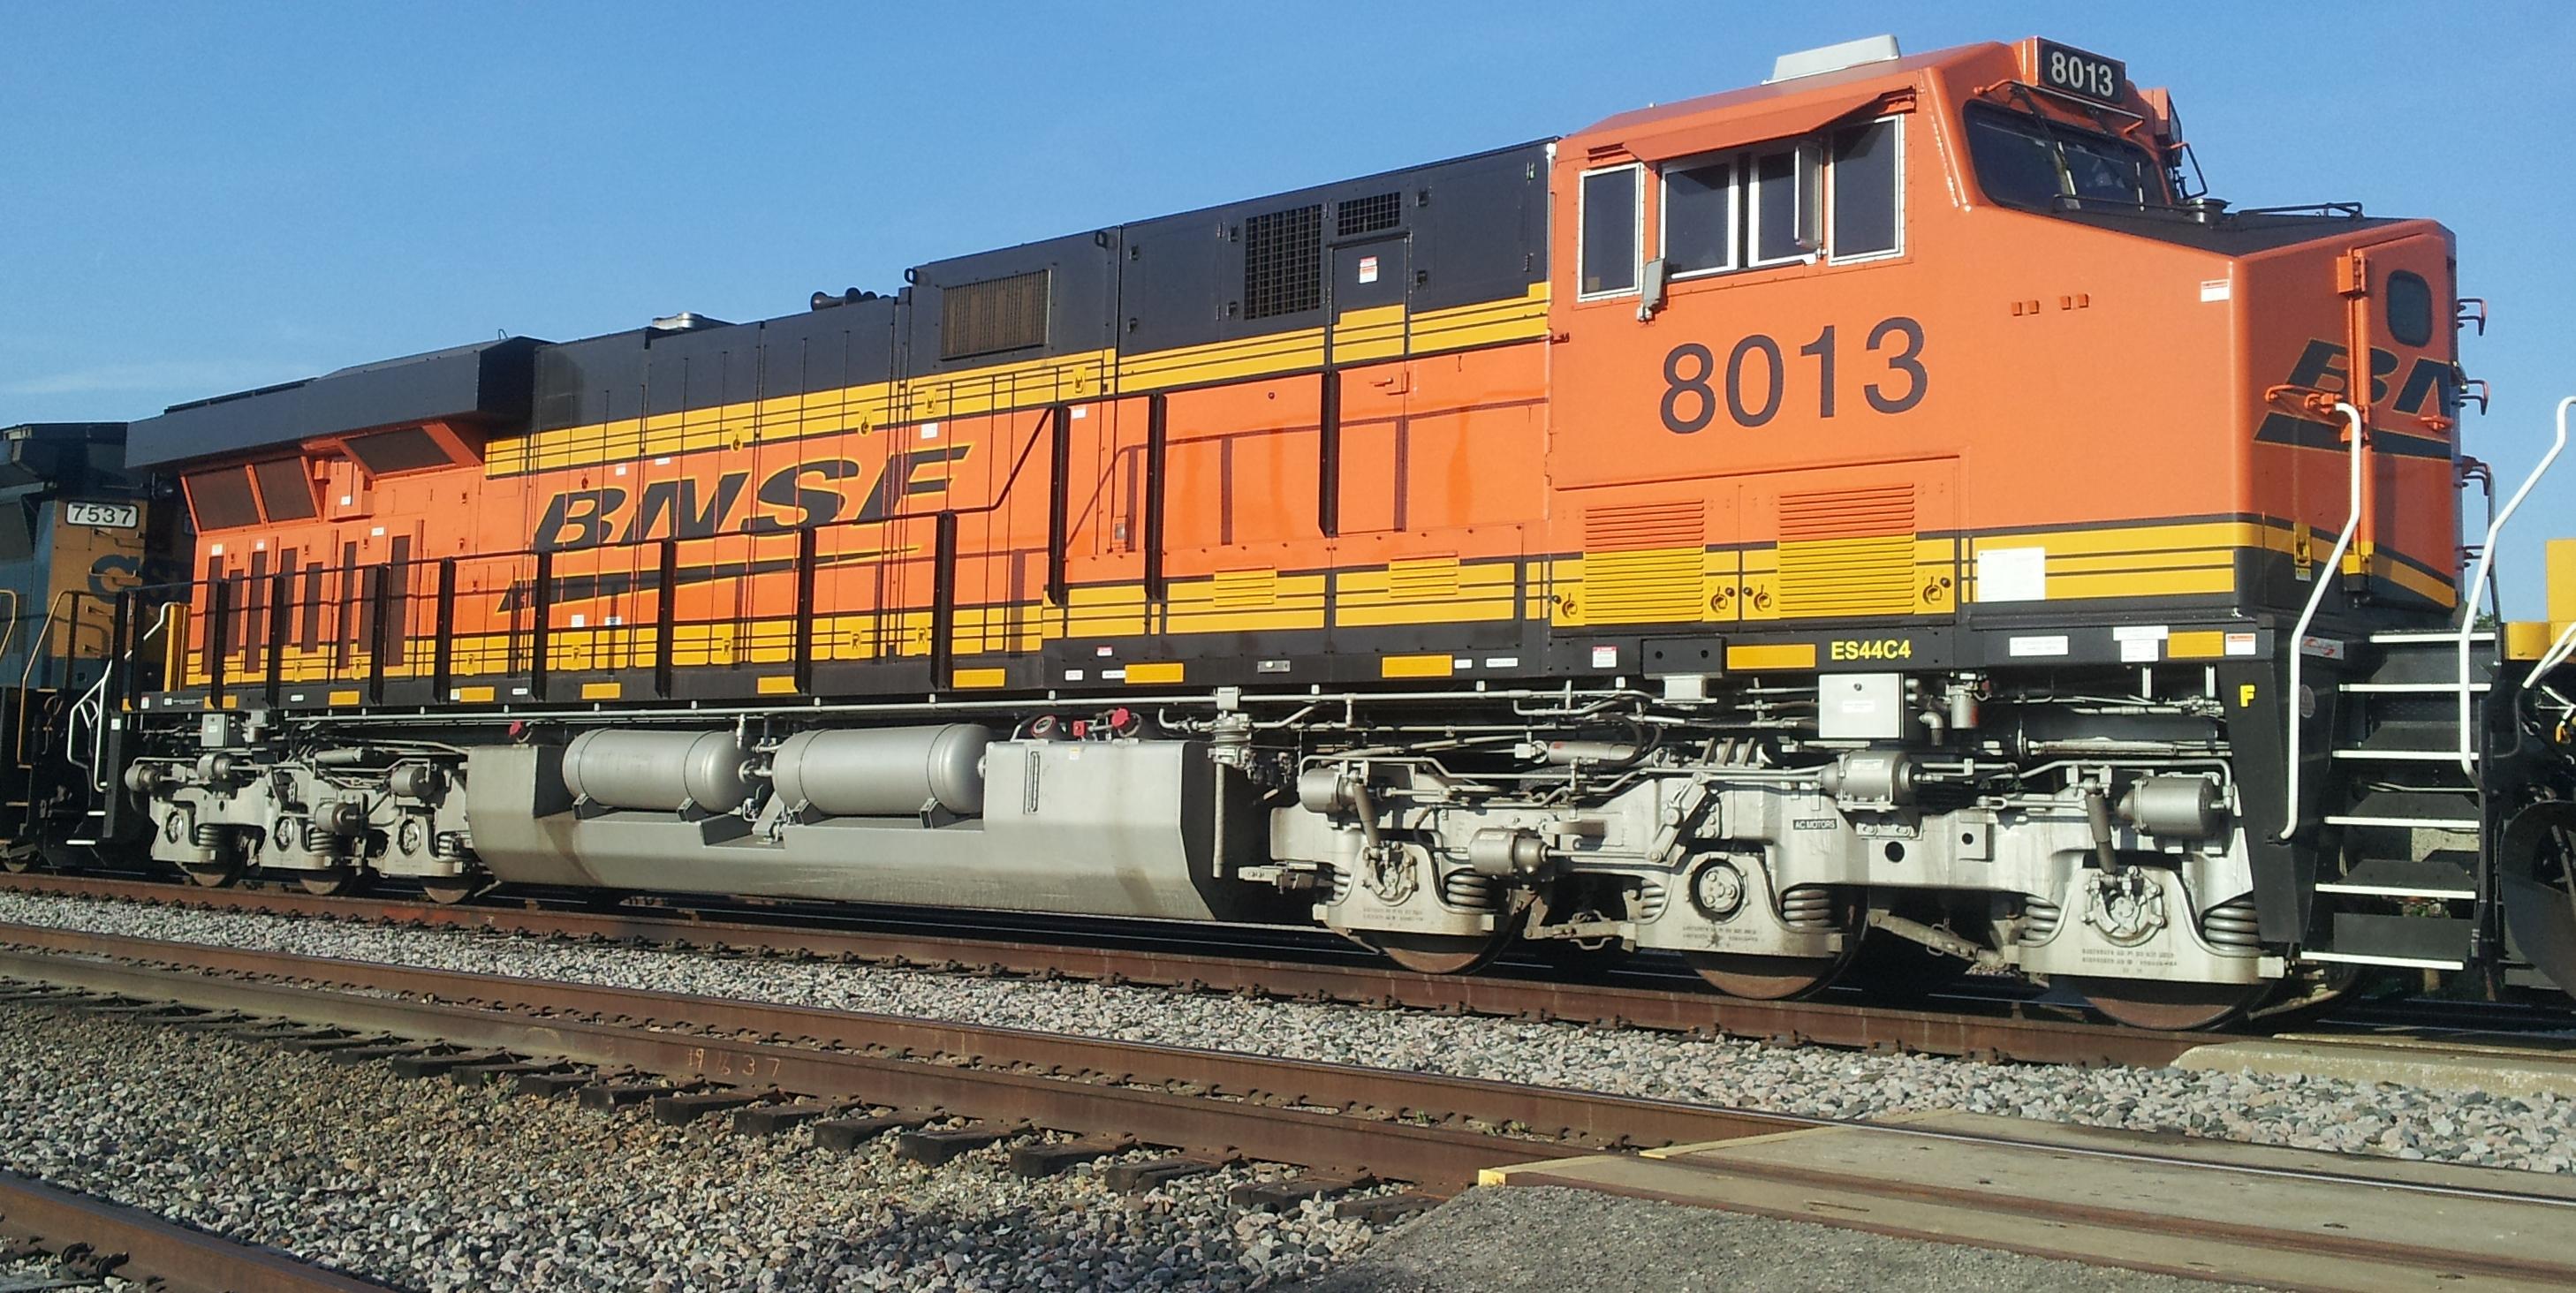 BNSF 8013.jpg